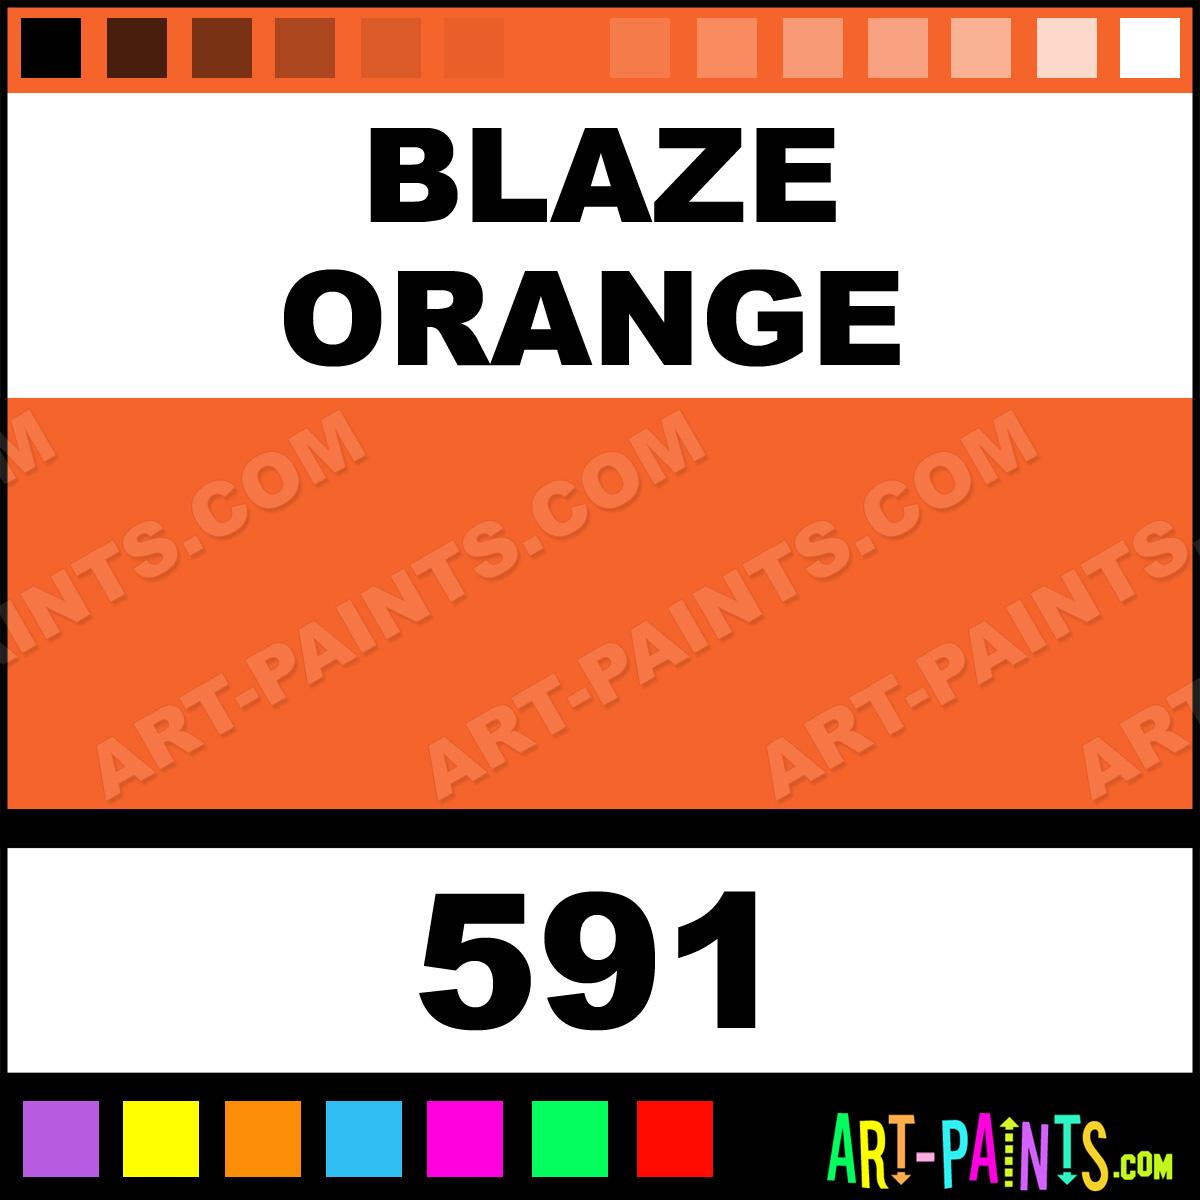 Blaze Orange Inks And Paint